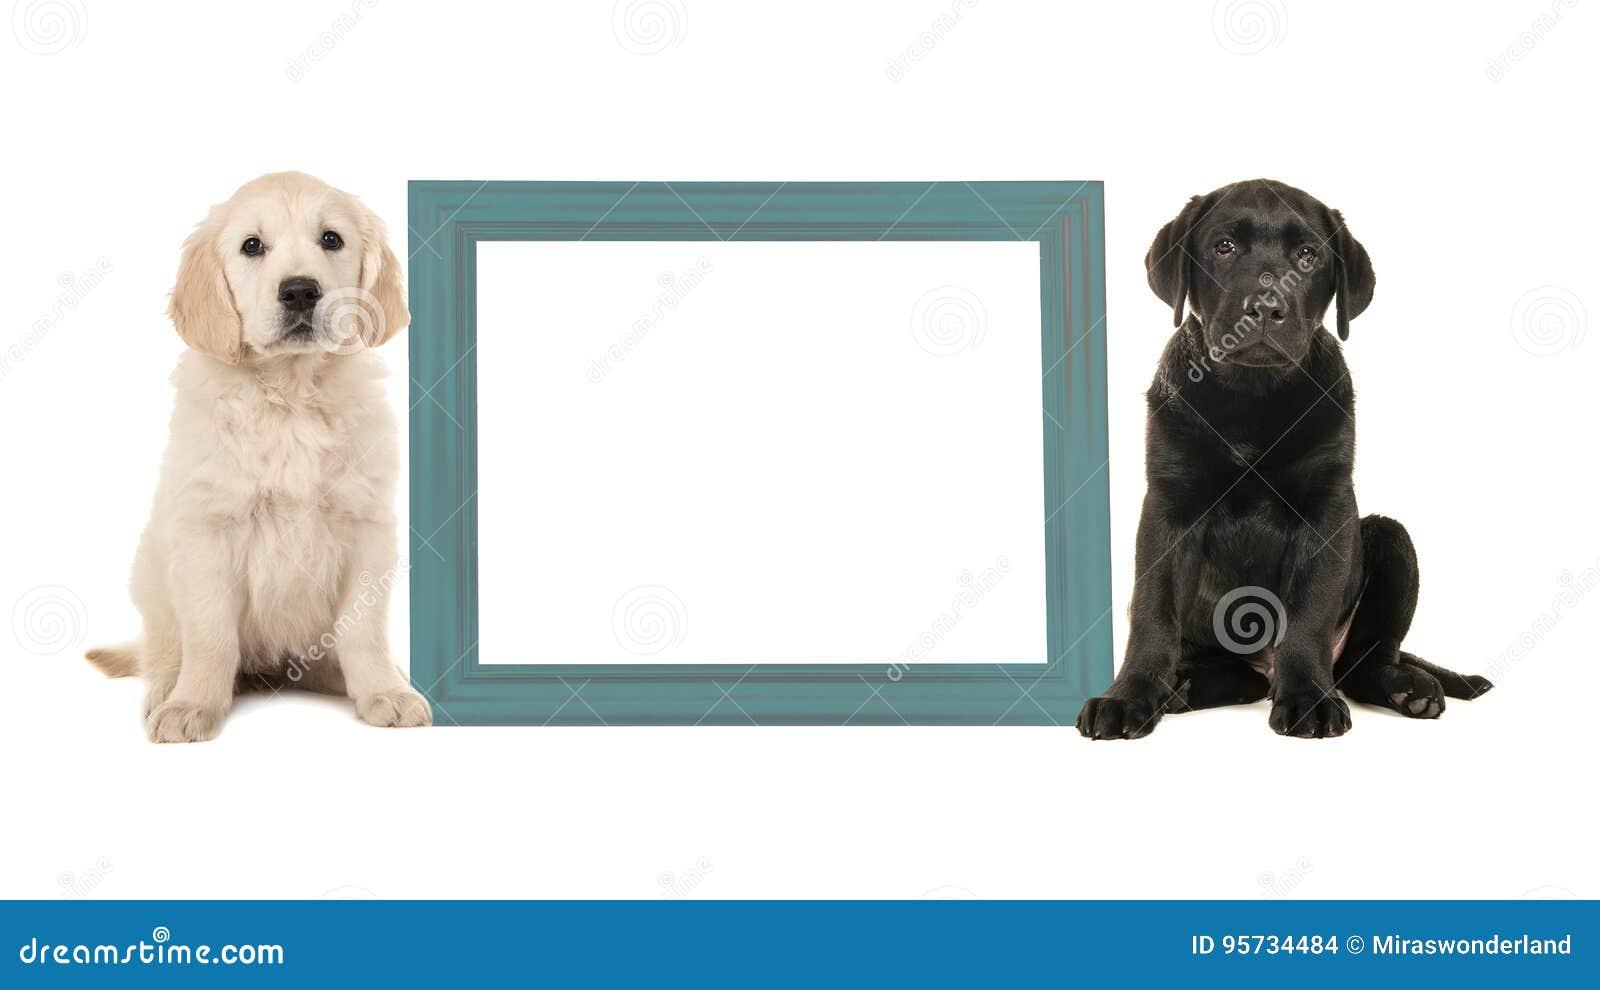 Black Labrador Puppy Dog And Golden Retriever Puppy Sitting Next To ...